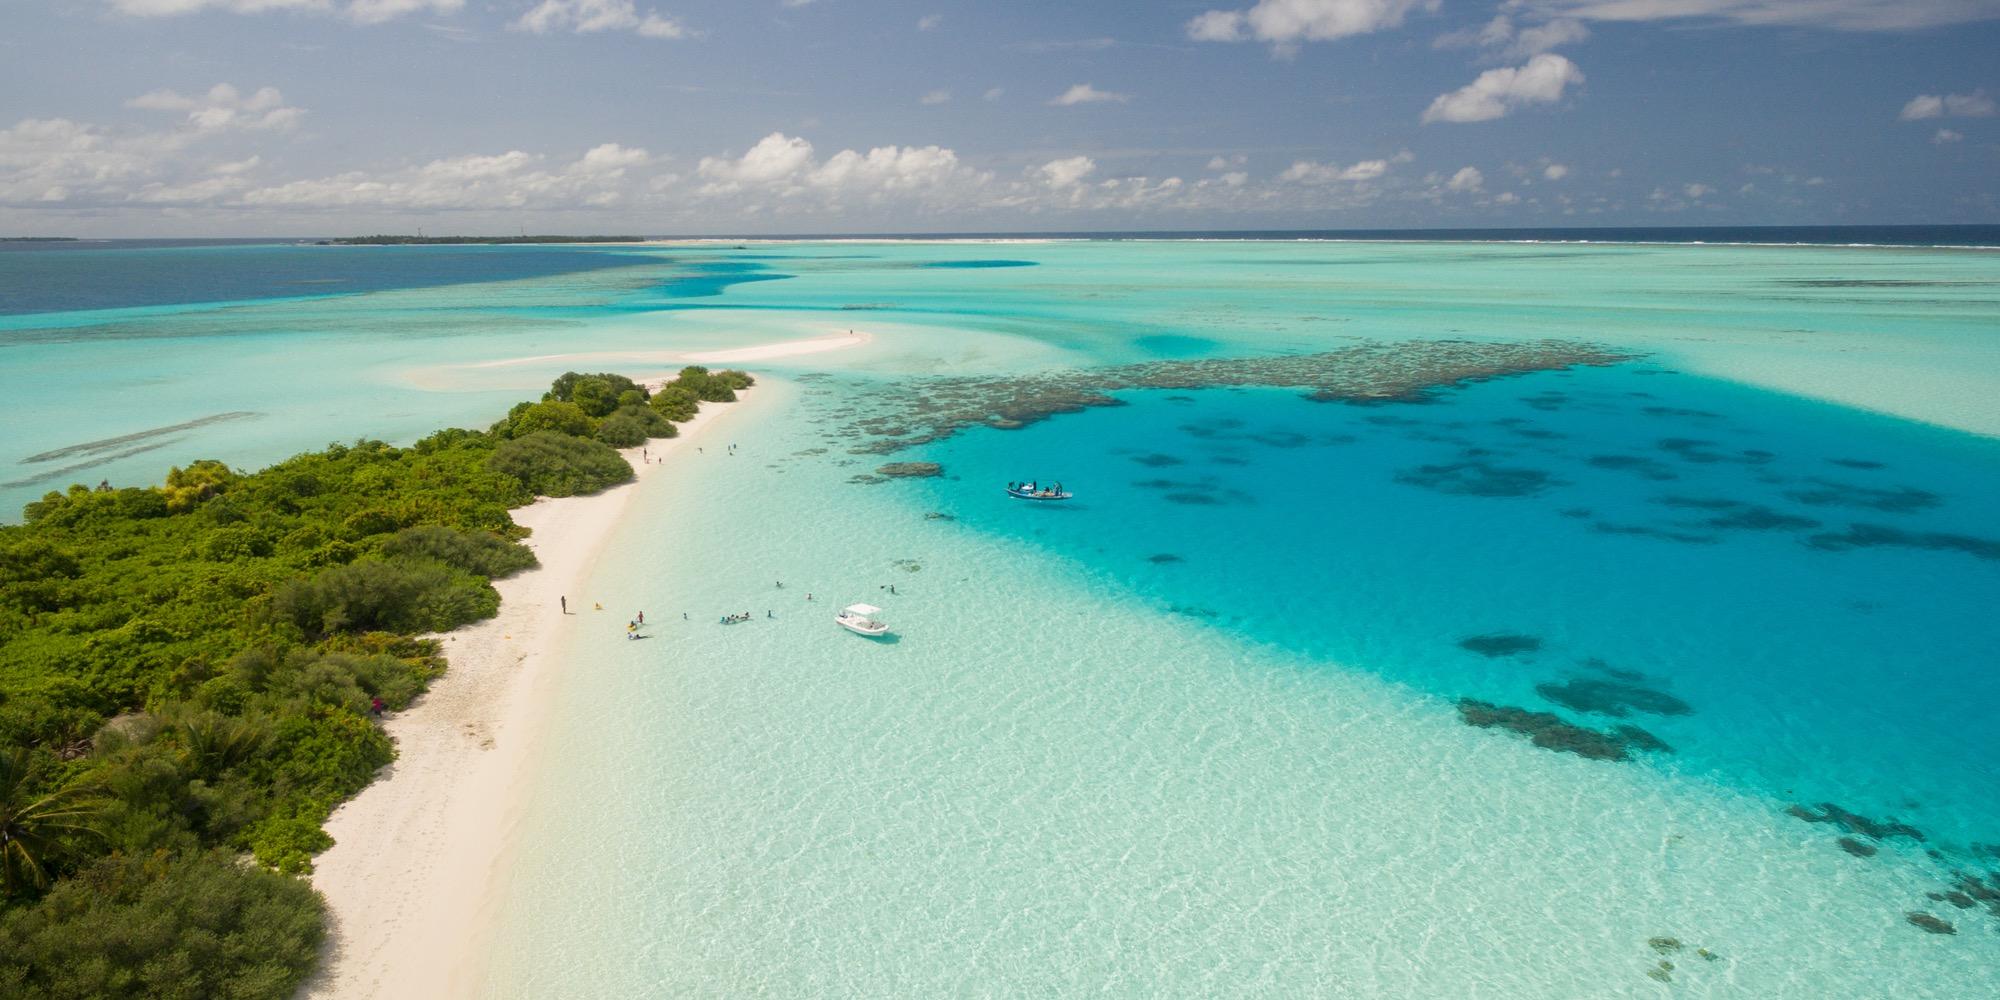 A beautiful island and surrounding sea